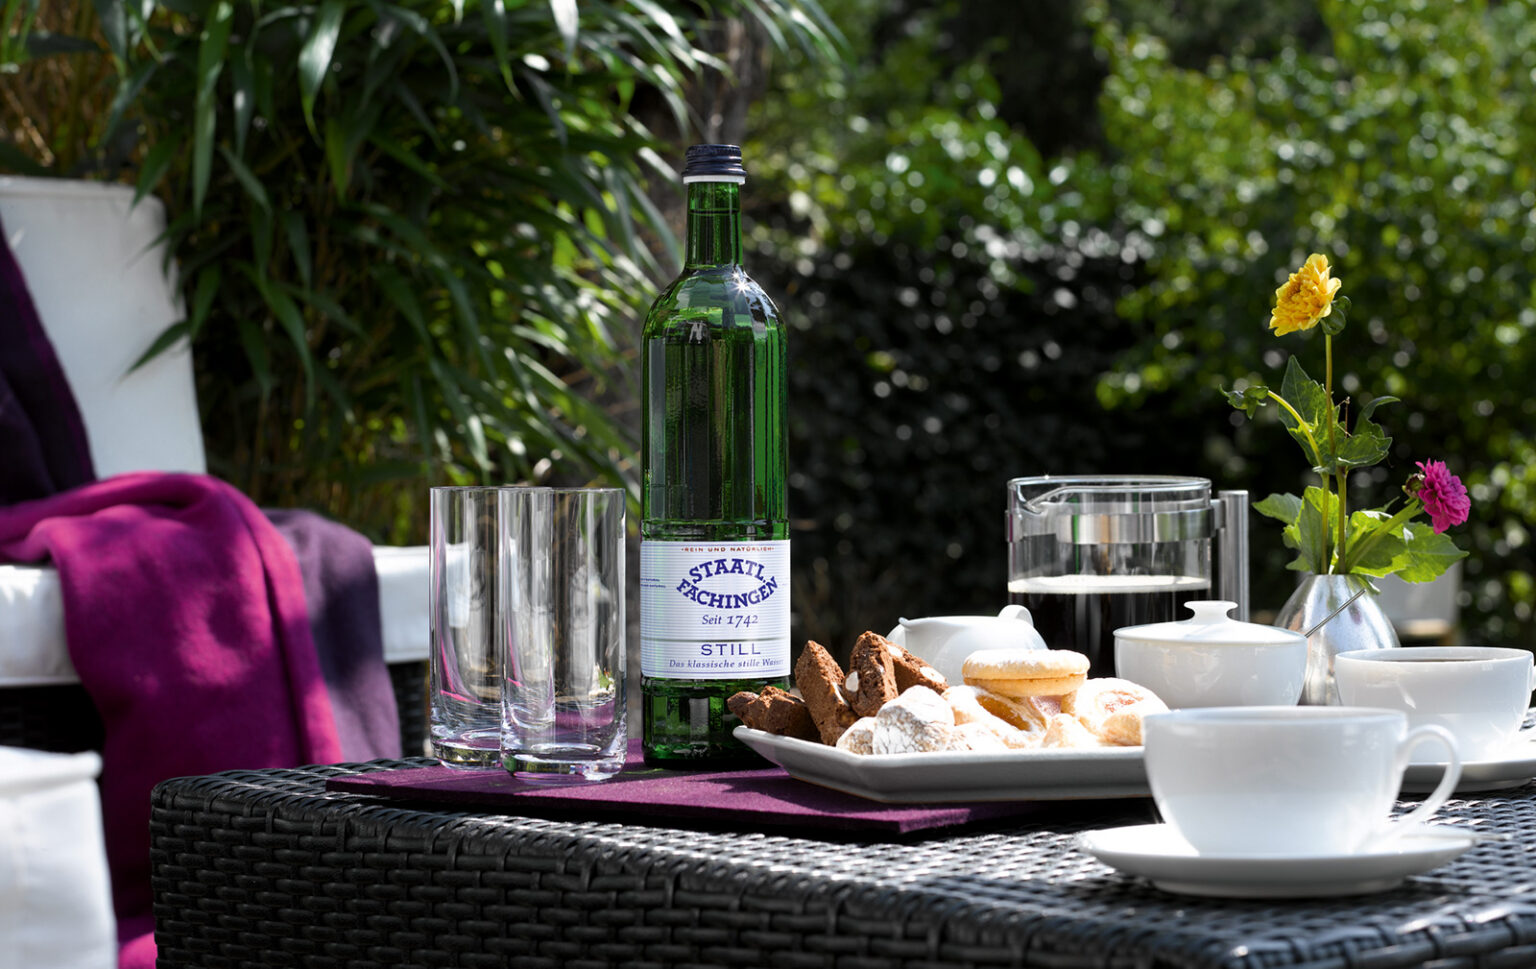 FINESSE, Food, Gourmet, Magazin, Mineralwasser, Staatl. Fachingen